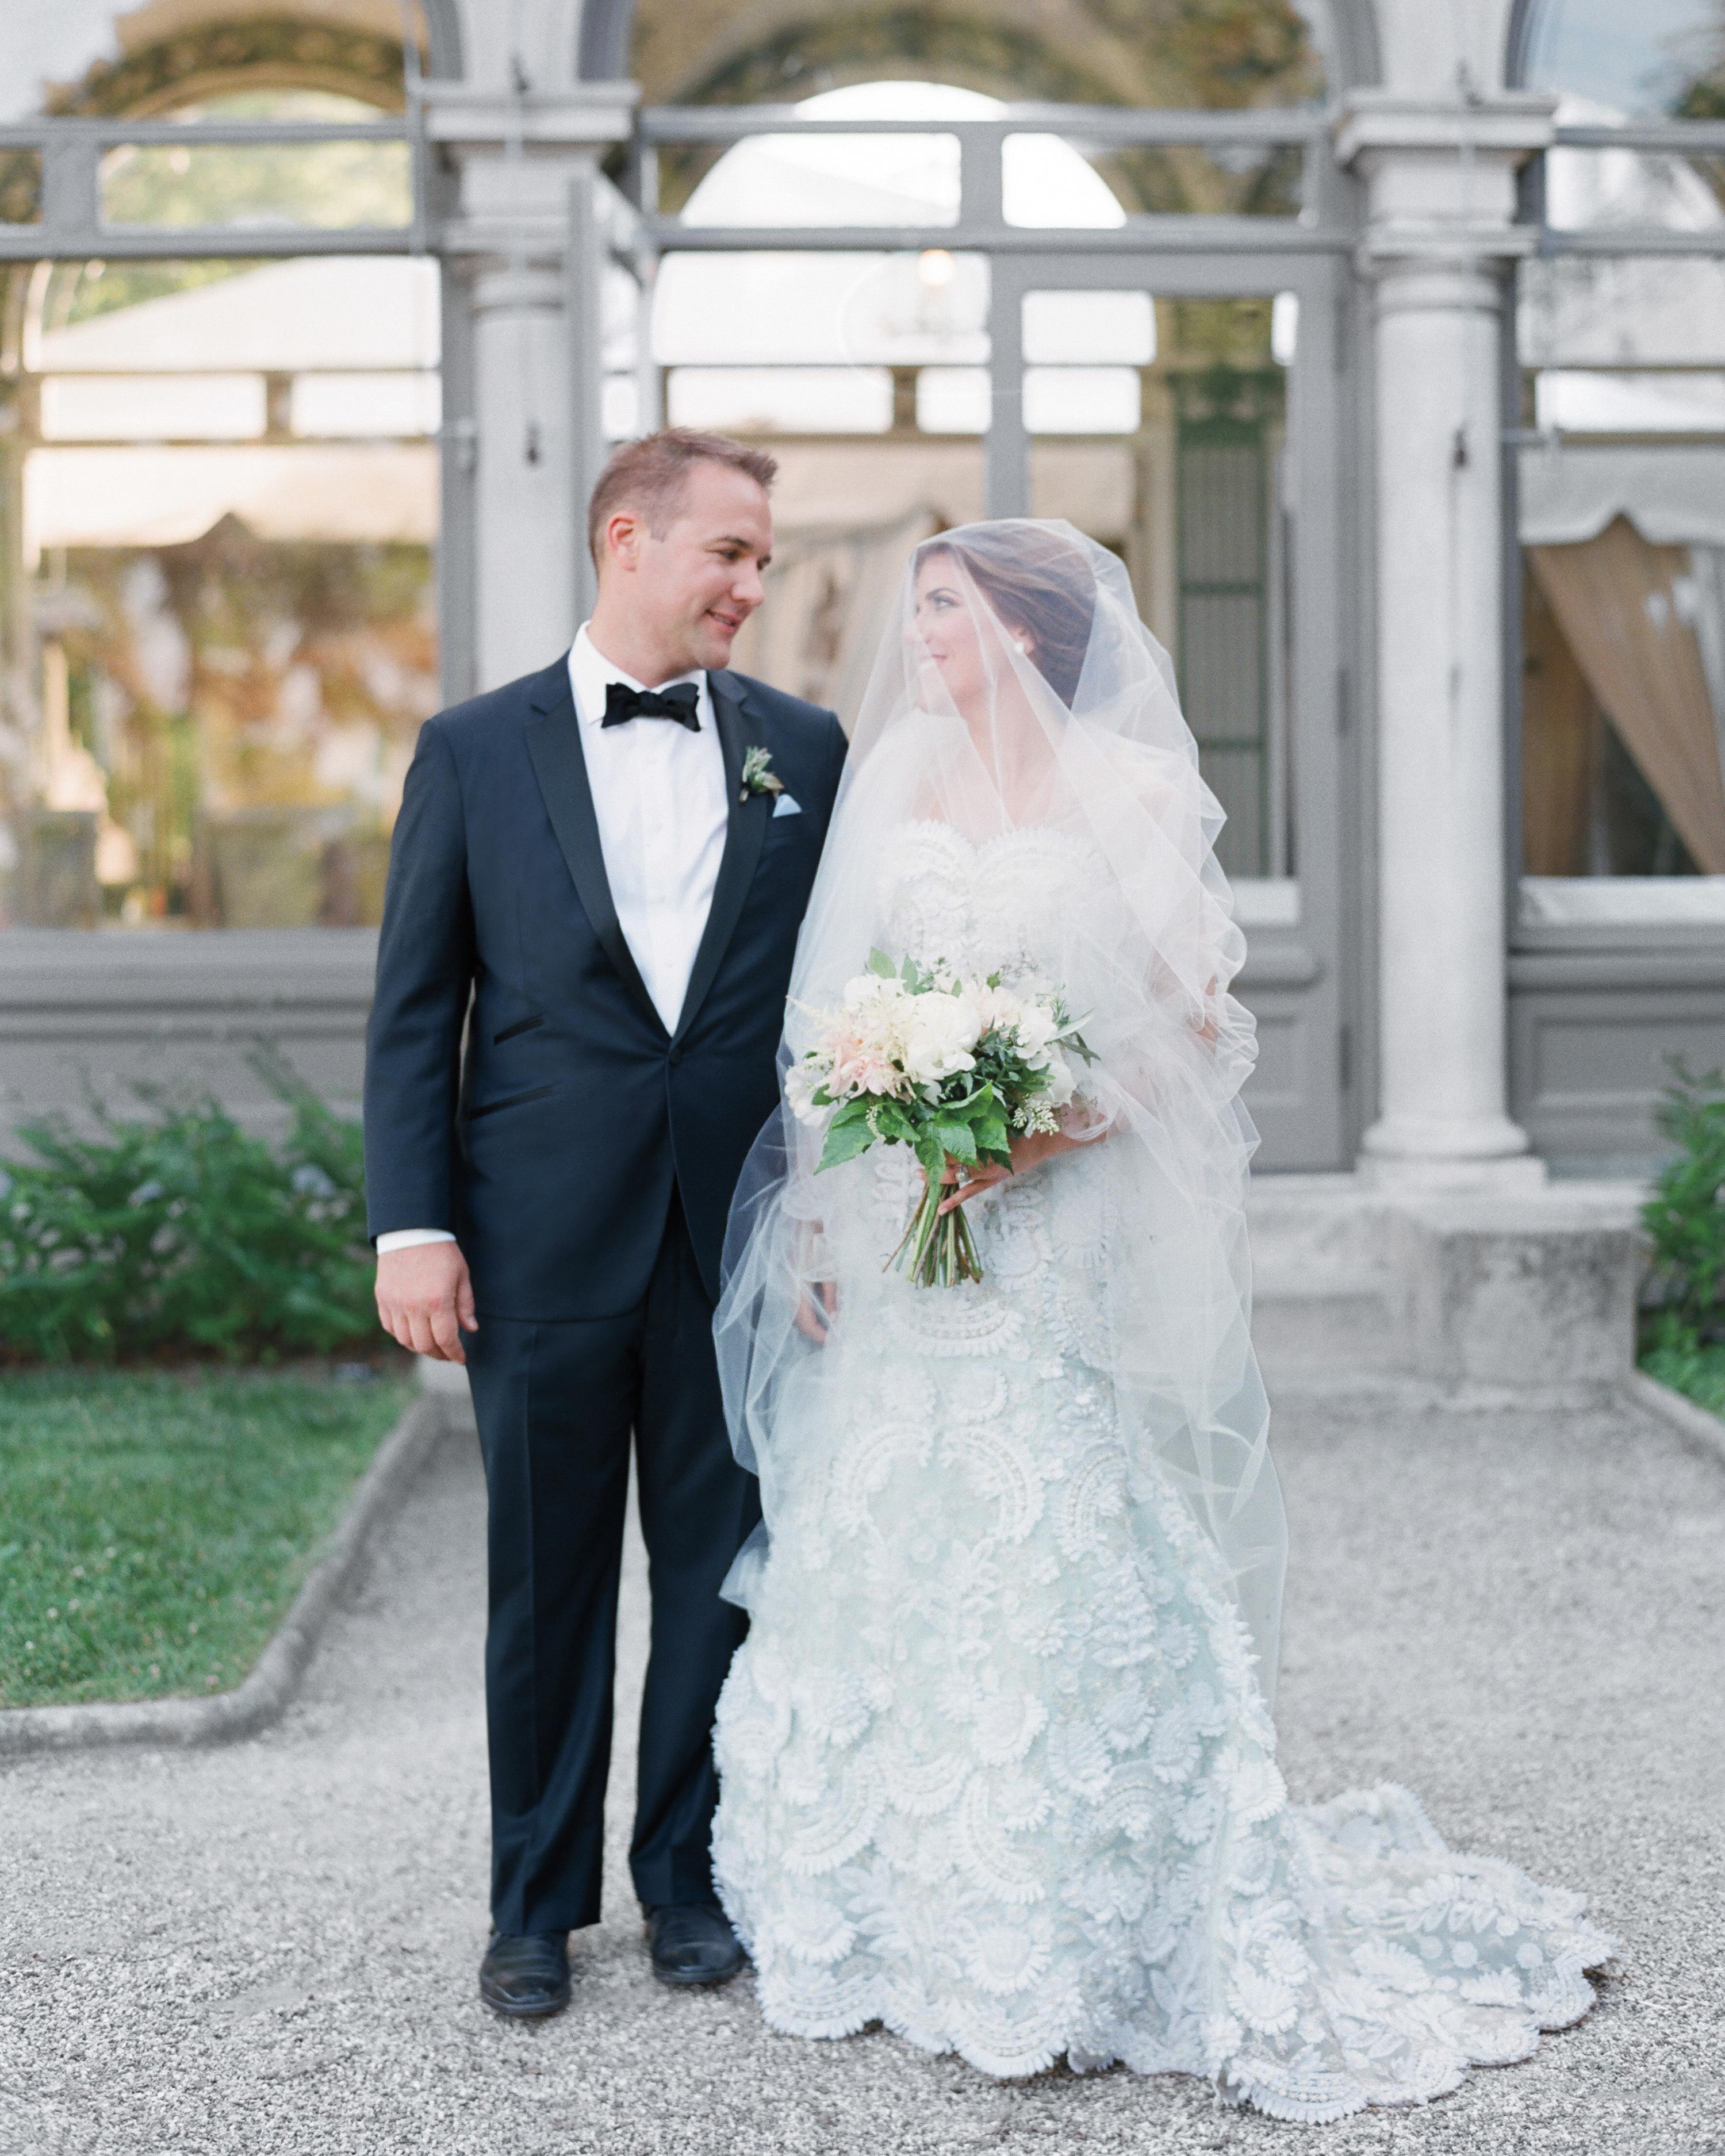 tara-nick-wedding-connecticut-190-s112082.jpg